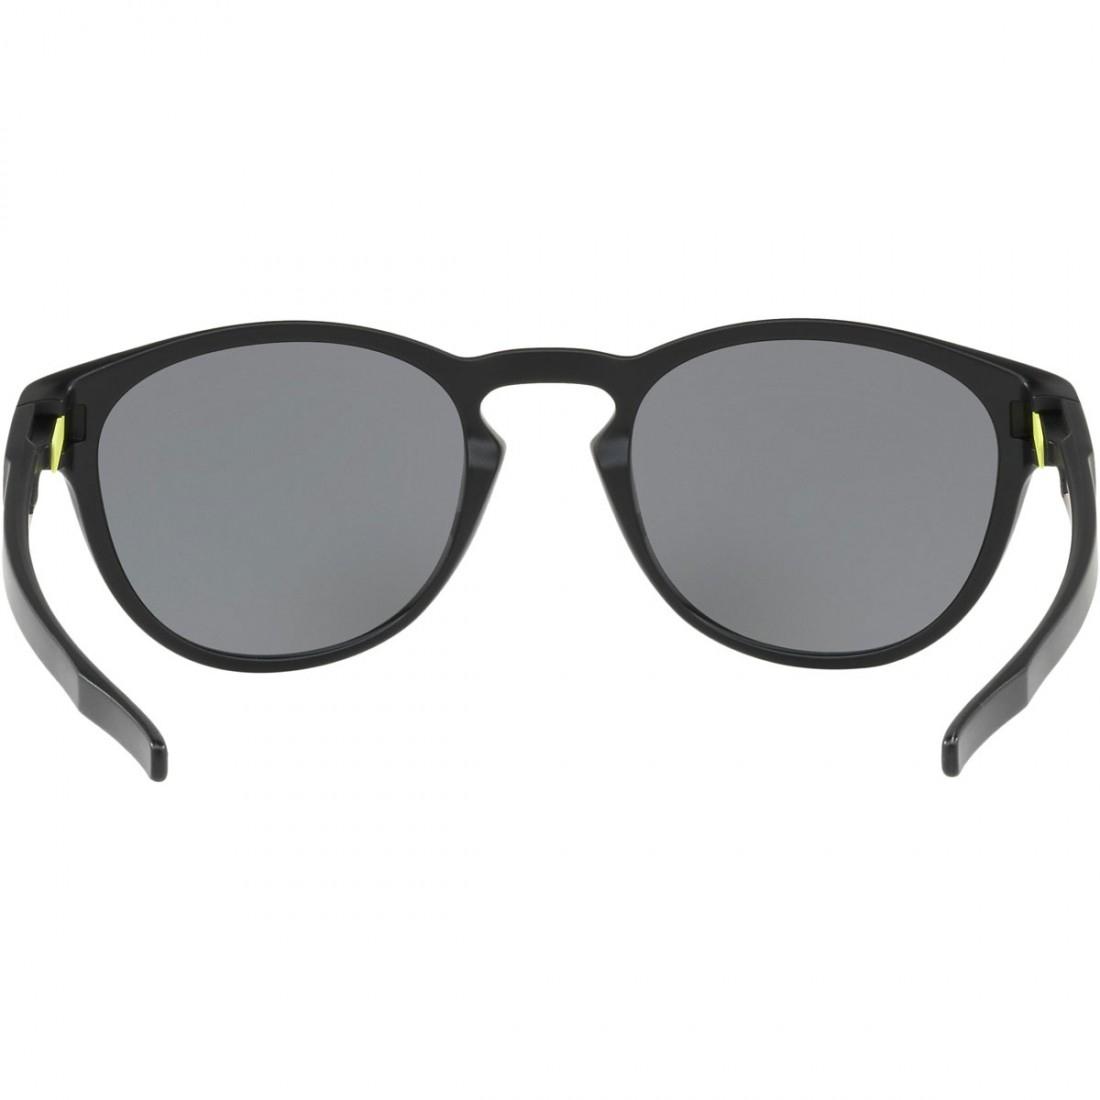 6d088165a057c5 Lunettes de soleil OAKLEY Latch Valentino Rossi Signature Series Matte  Black   Chrome Iridium